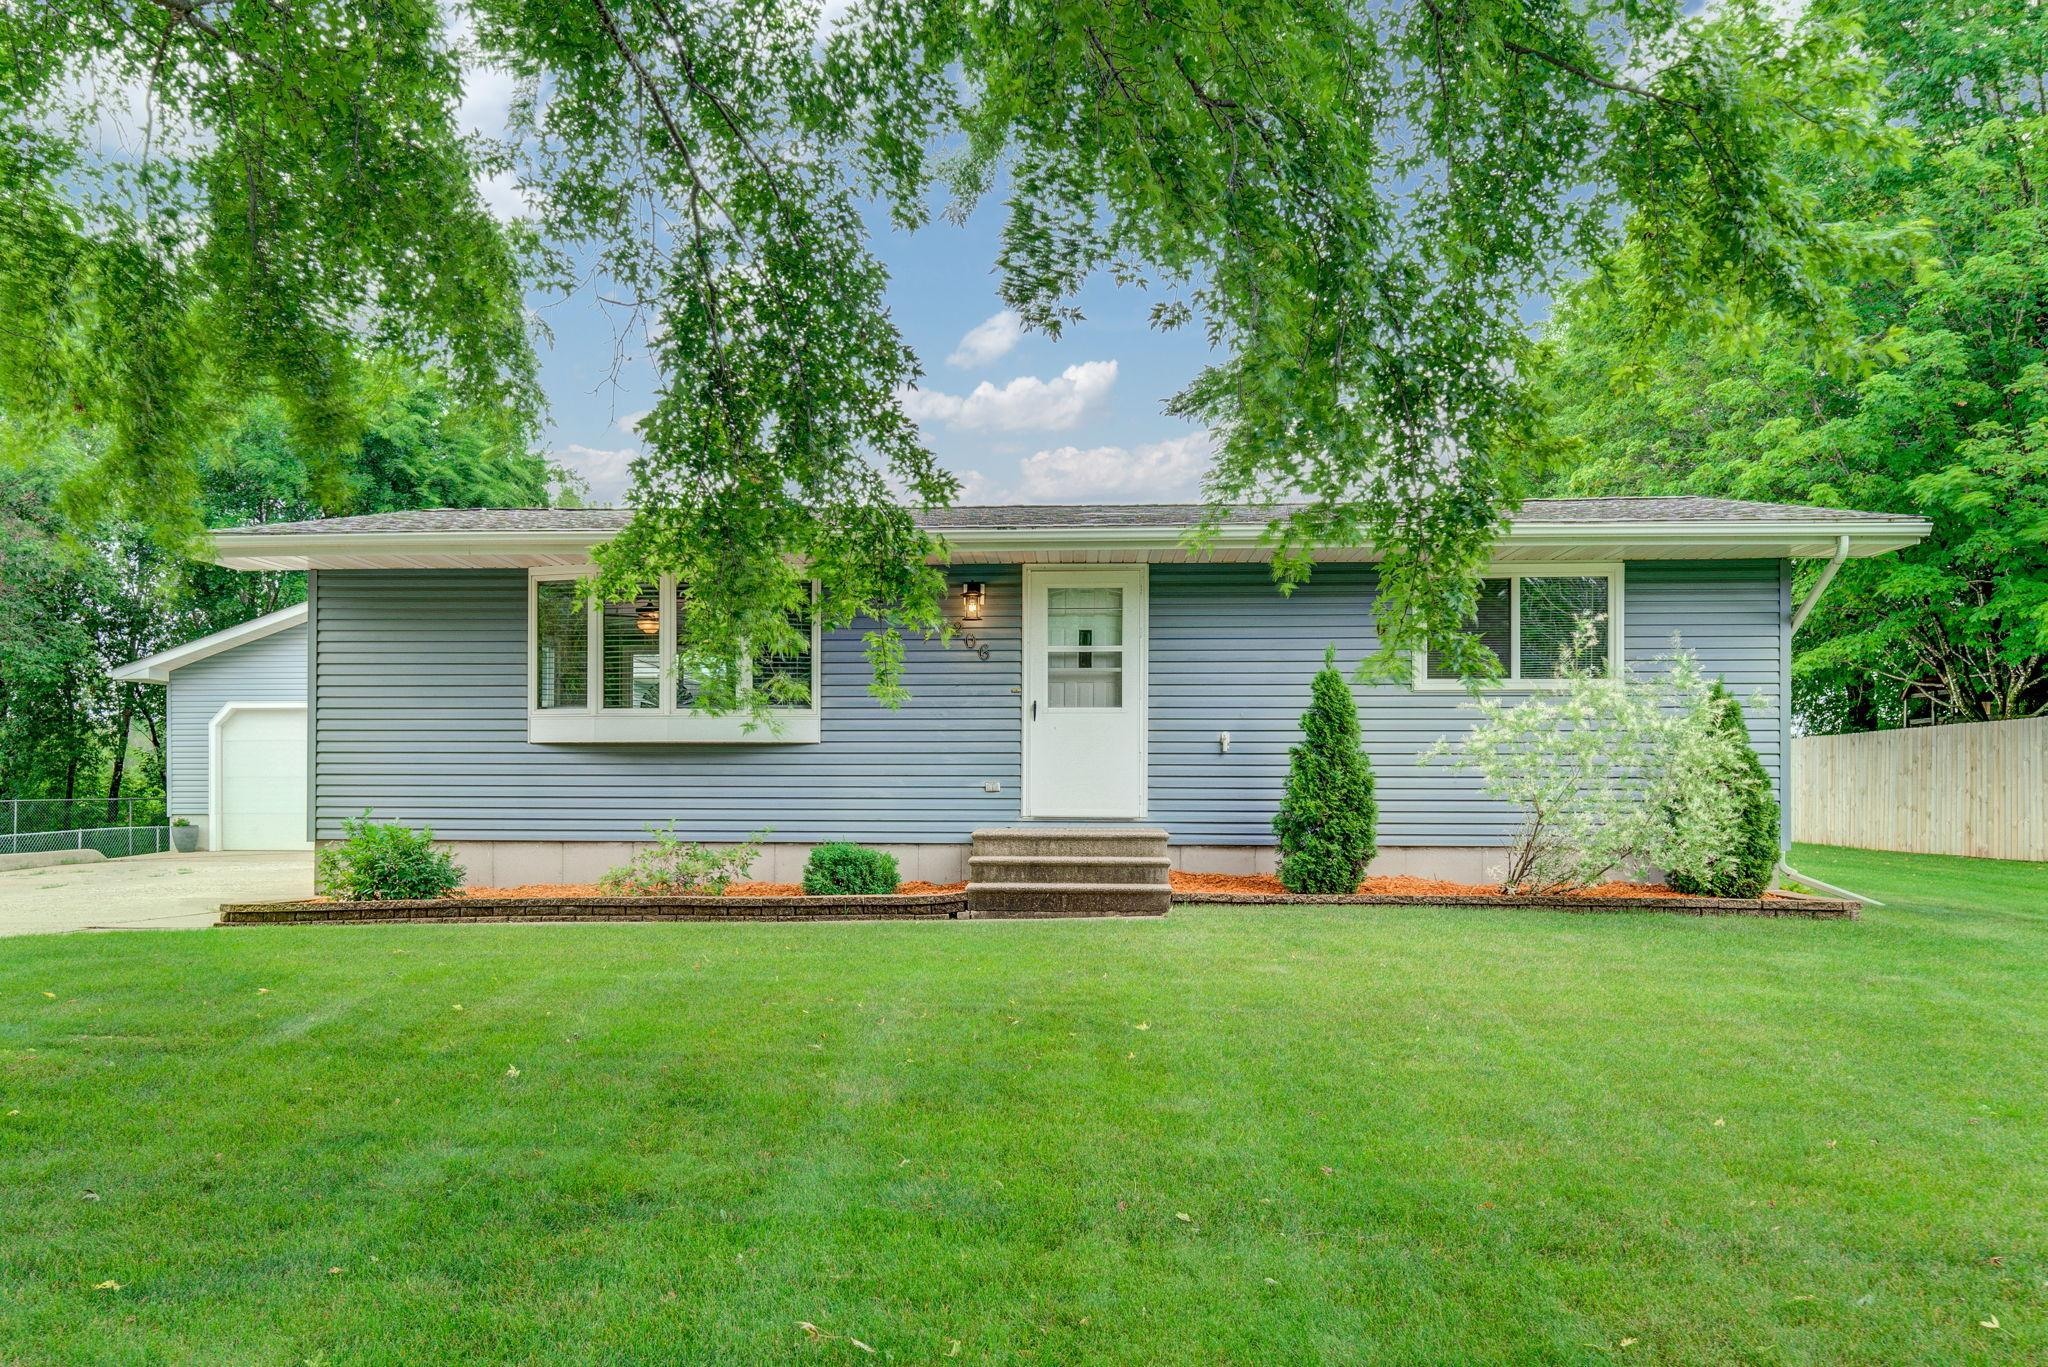 206 Sunrise Property Photo - Somerset, WI real estate listing